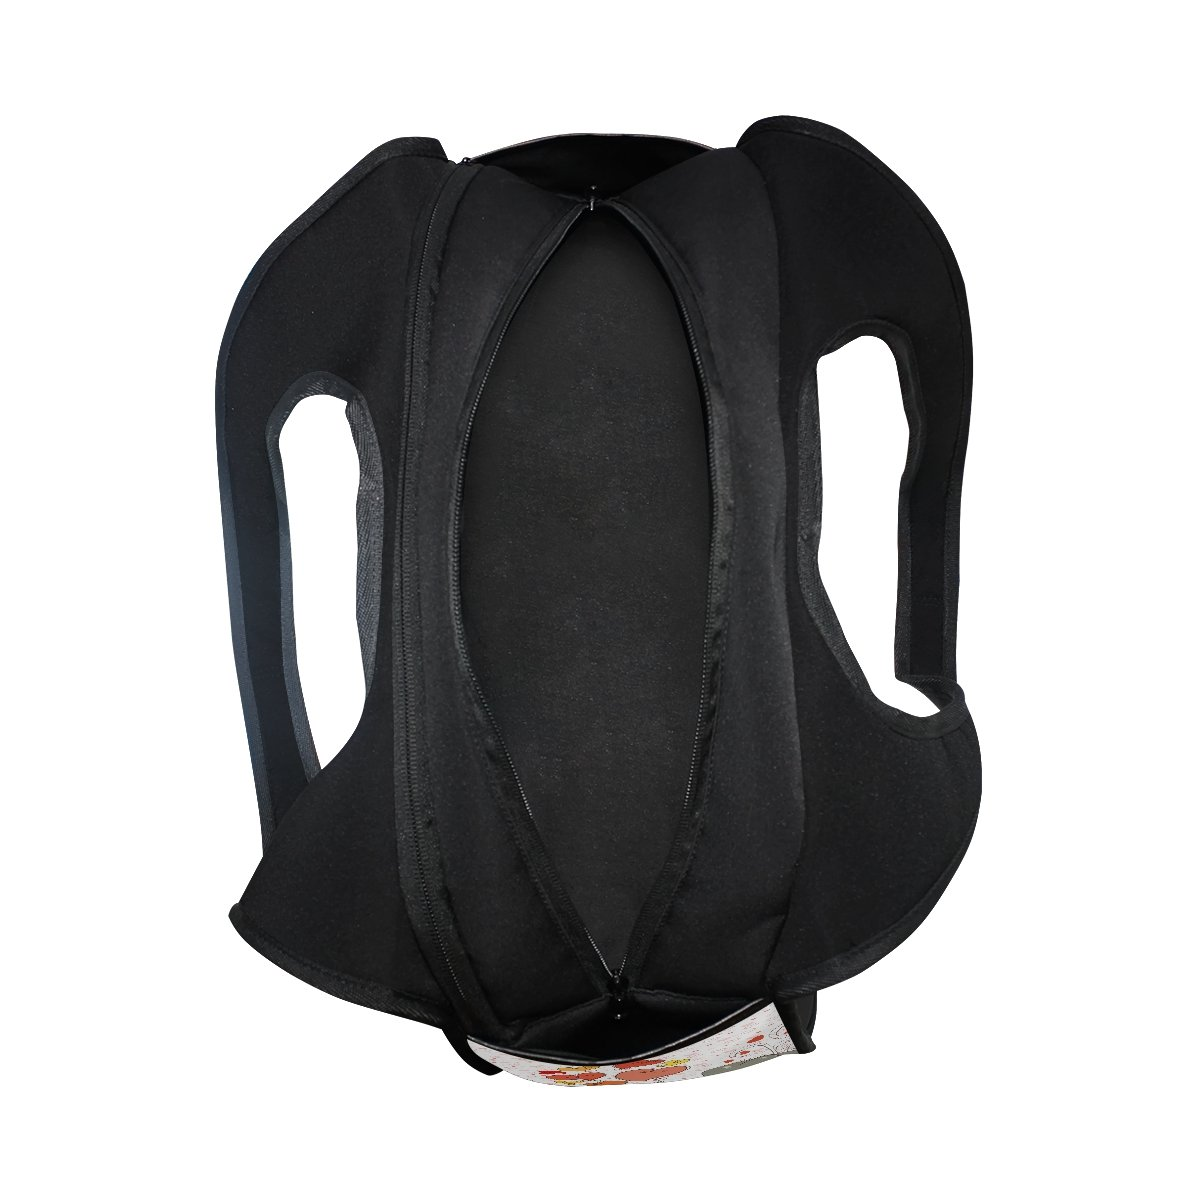 AHOMY Sports Gym Bag Elephant Love Heart Duffel Bag Travel Shoulder Bag by AHOMY (Image #5)